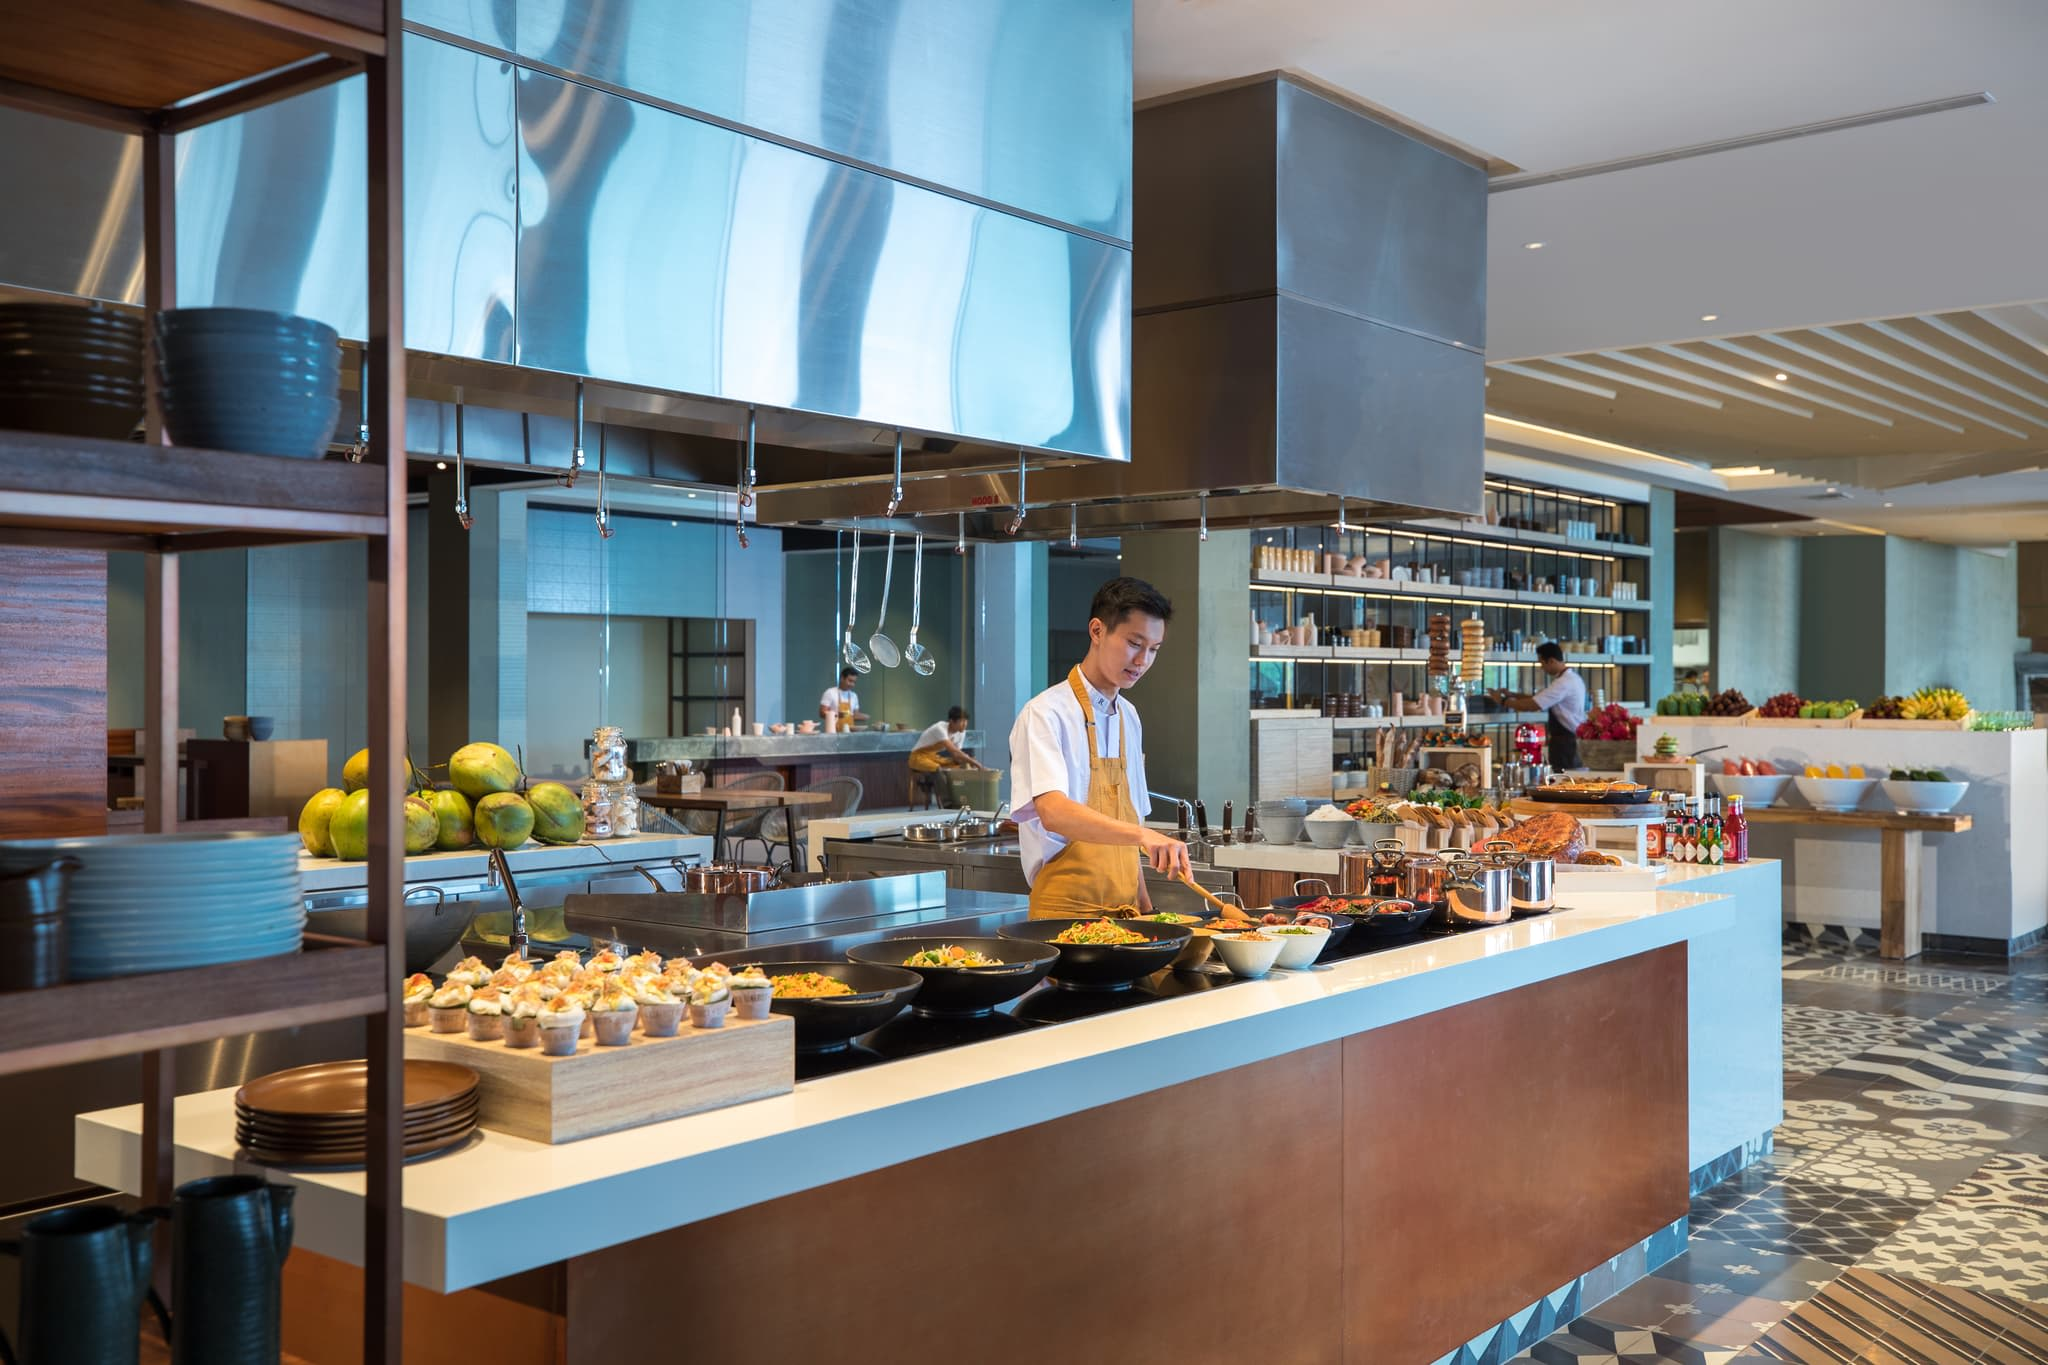 Renaissance Bali Uluwatu Resort & Spa F&B Voucher - Discover Dining Gift Voucher